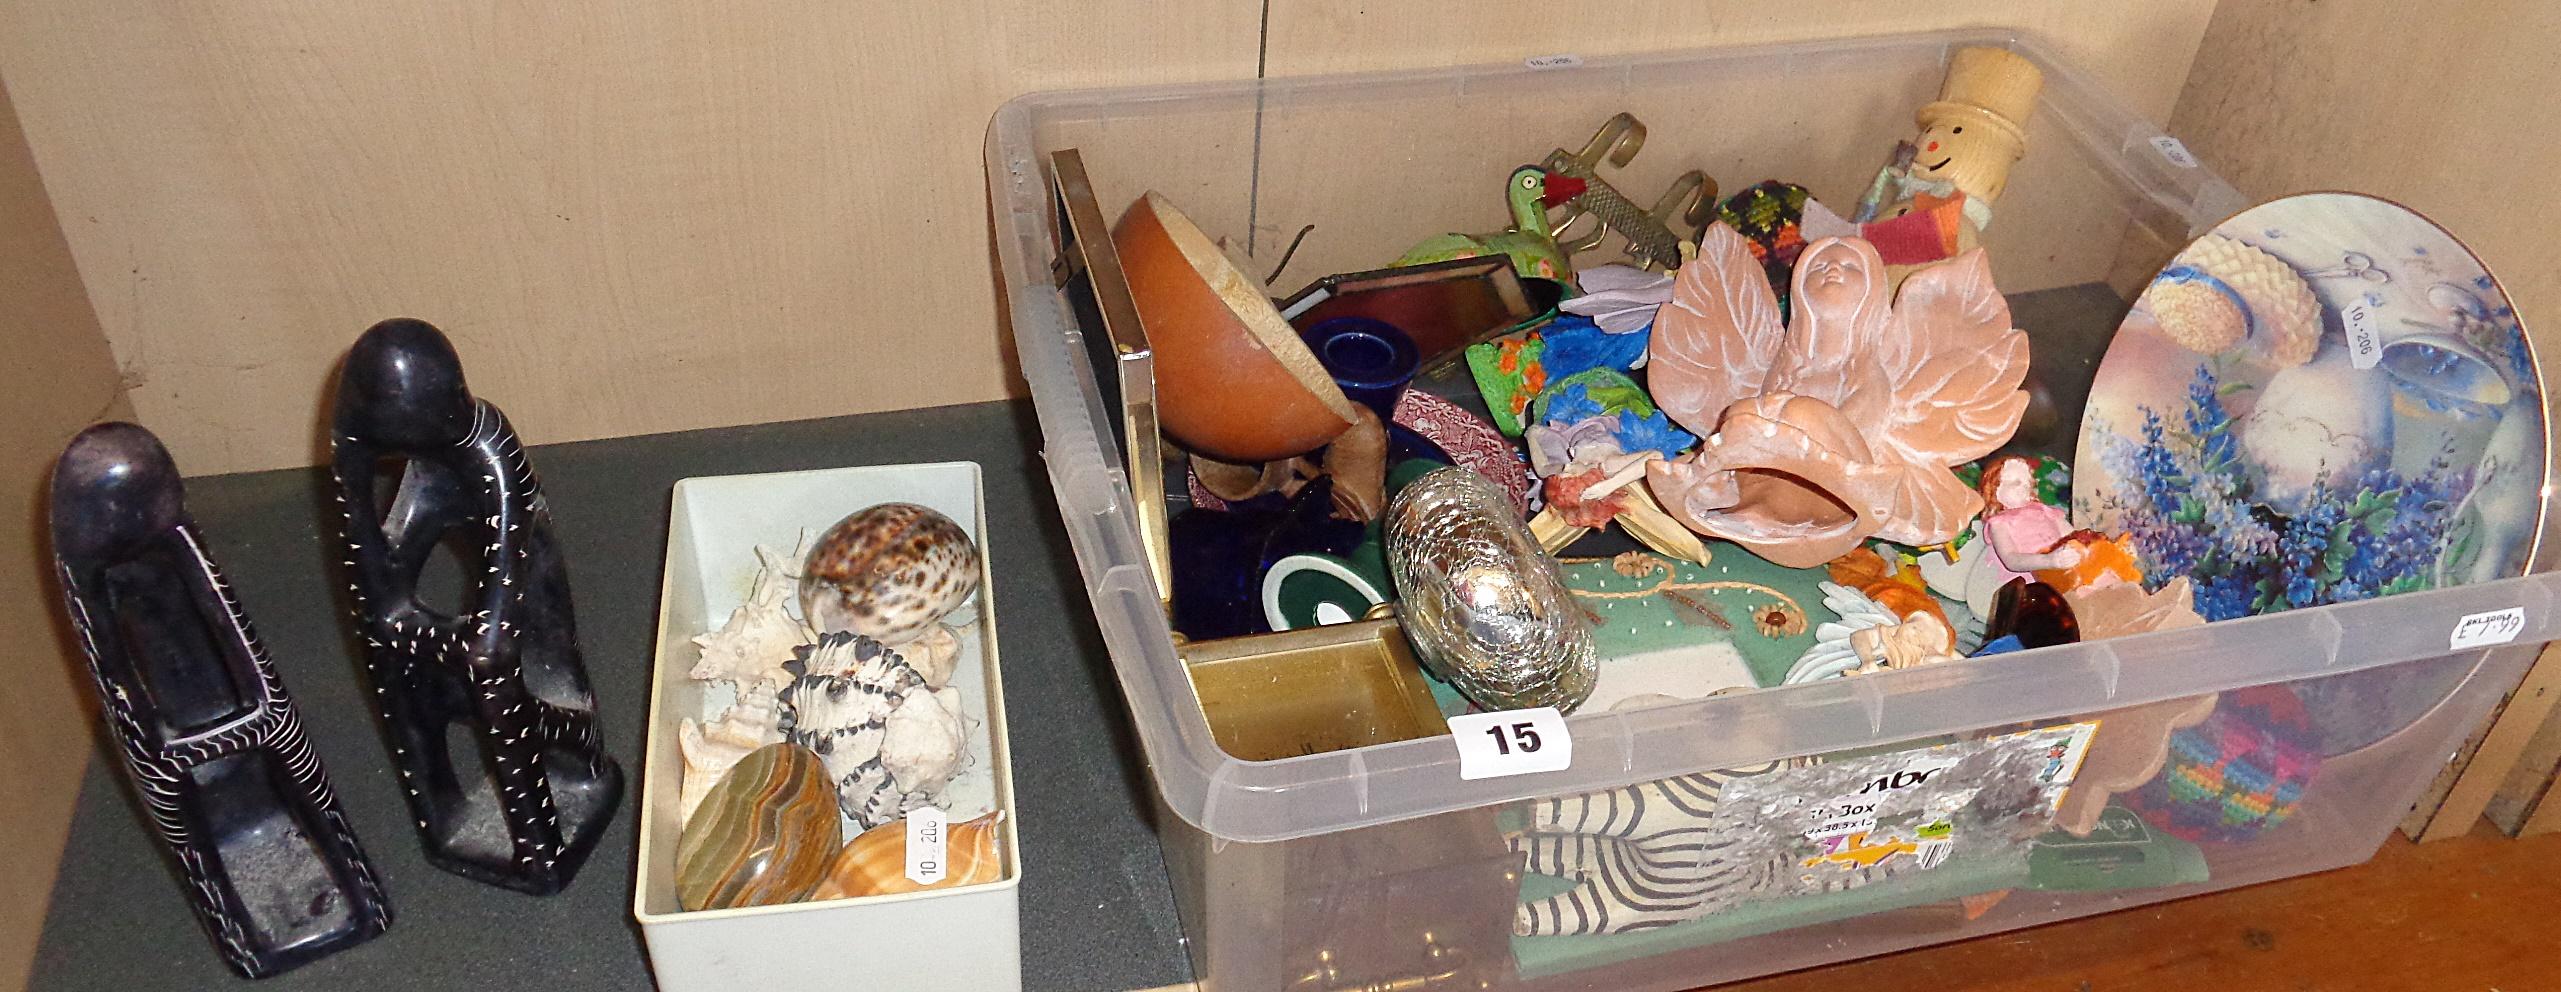 Lot 15 - Shelf of miscellaneous items